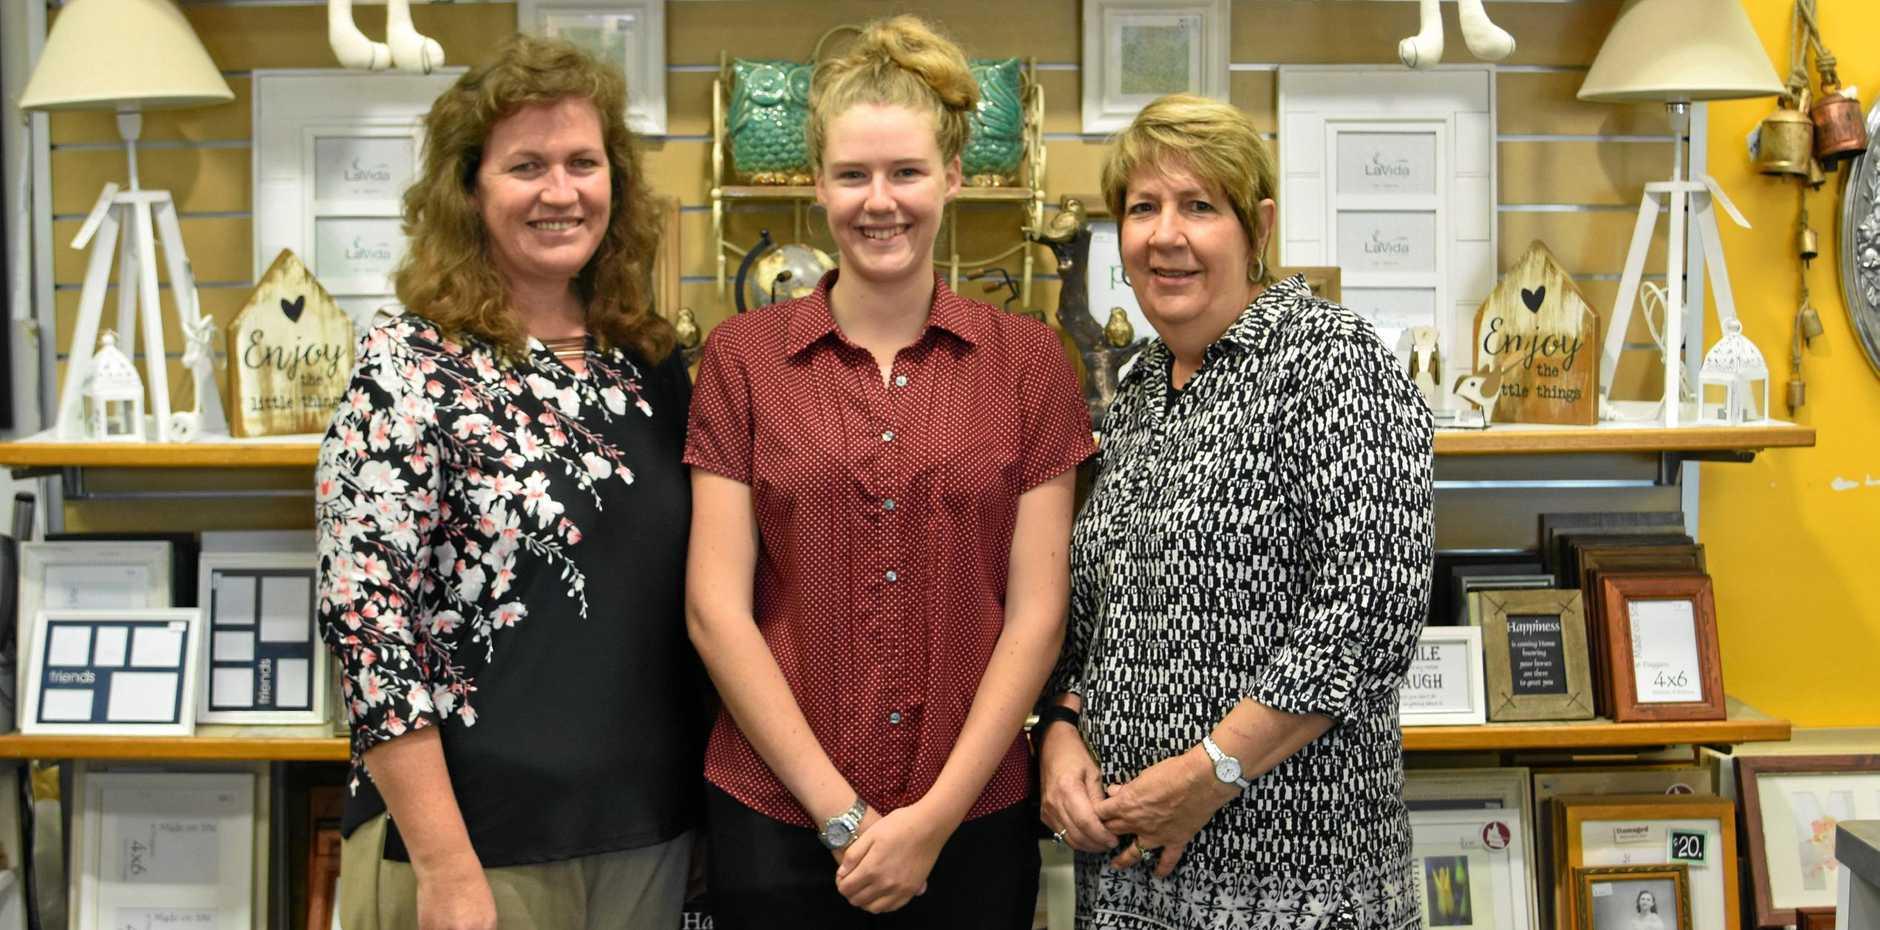 NEW BUSINESS DEVELOPMENT: Bronwyn and Stacey Christensen take over Duggan's camera store from Noelene Luck